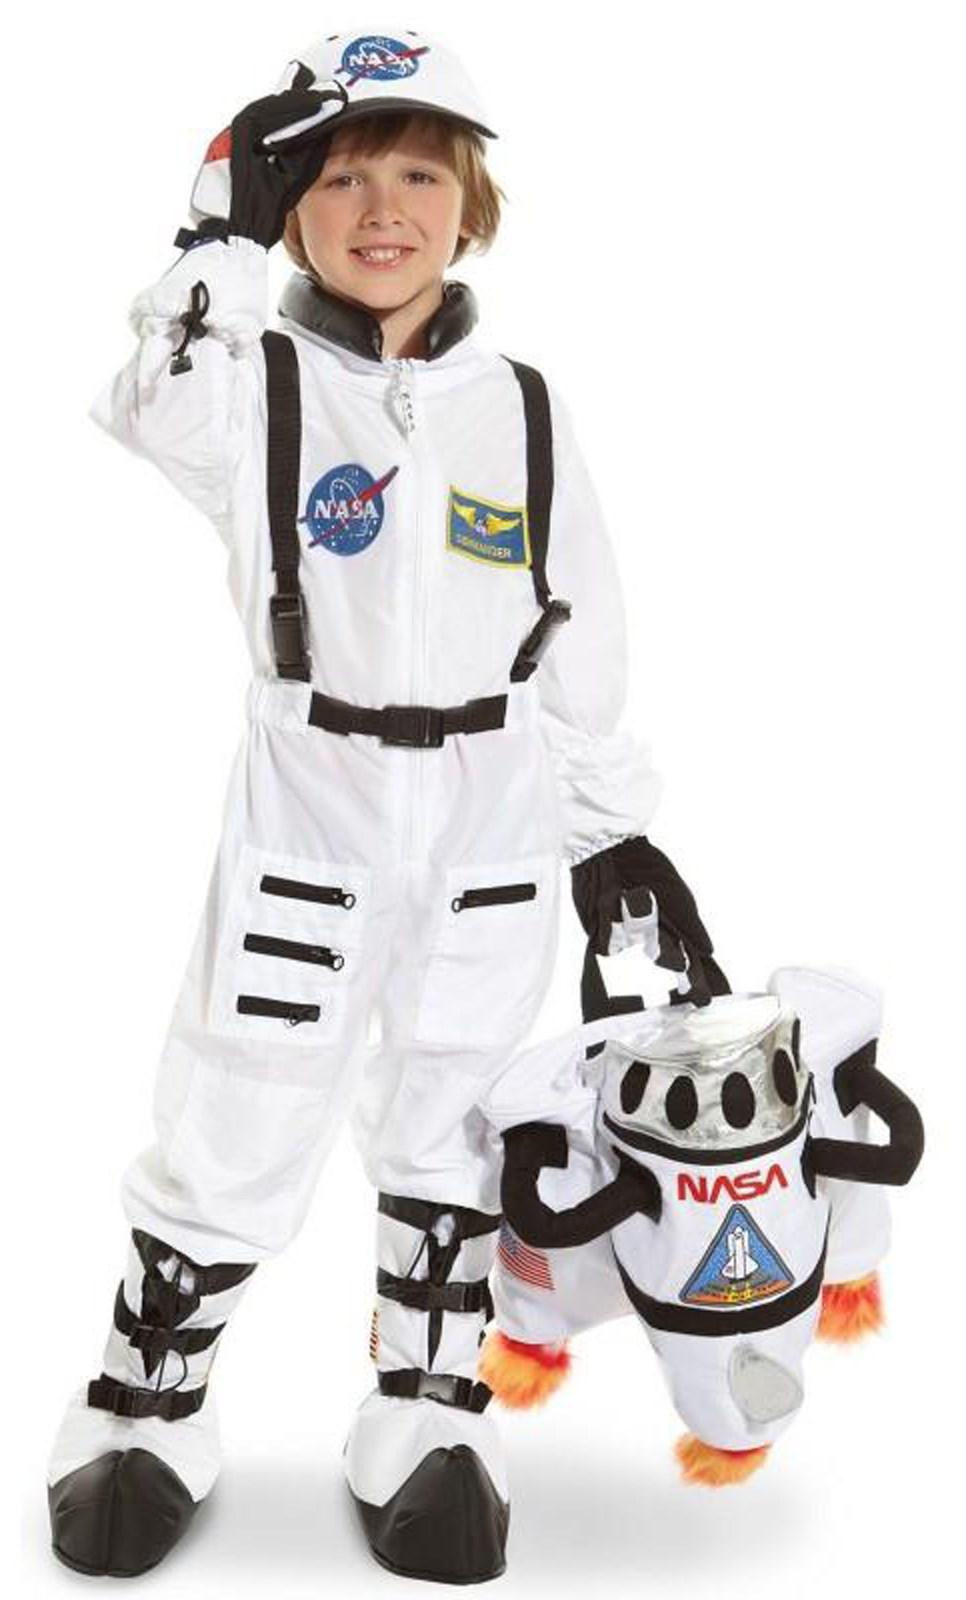 Jr Astronaut White Suit Child Costume BuyCostumescom - Astronaut decorations